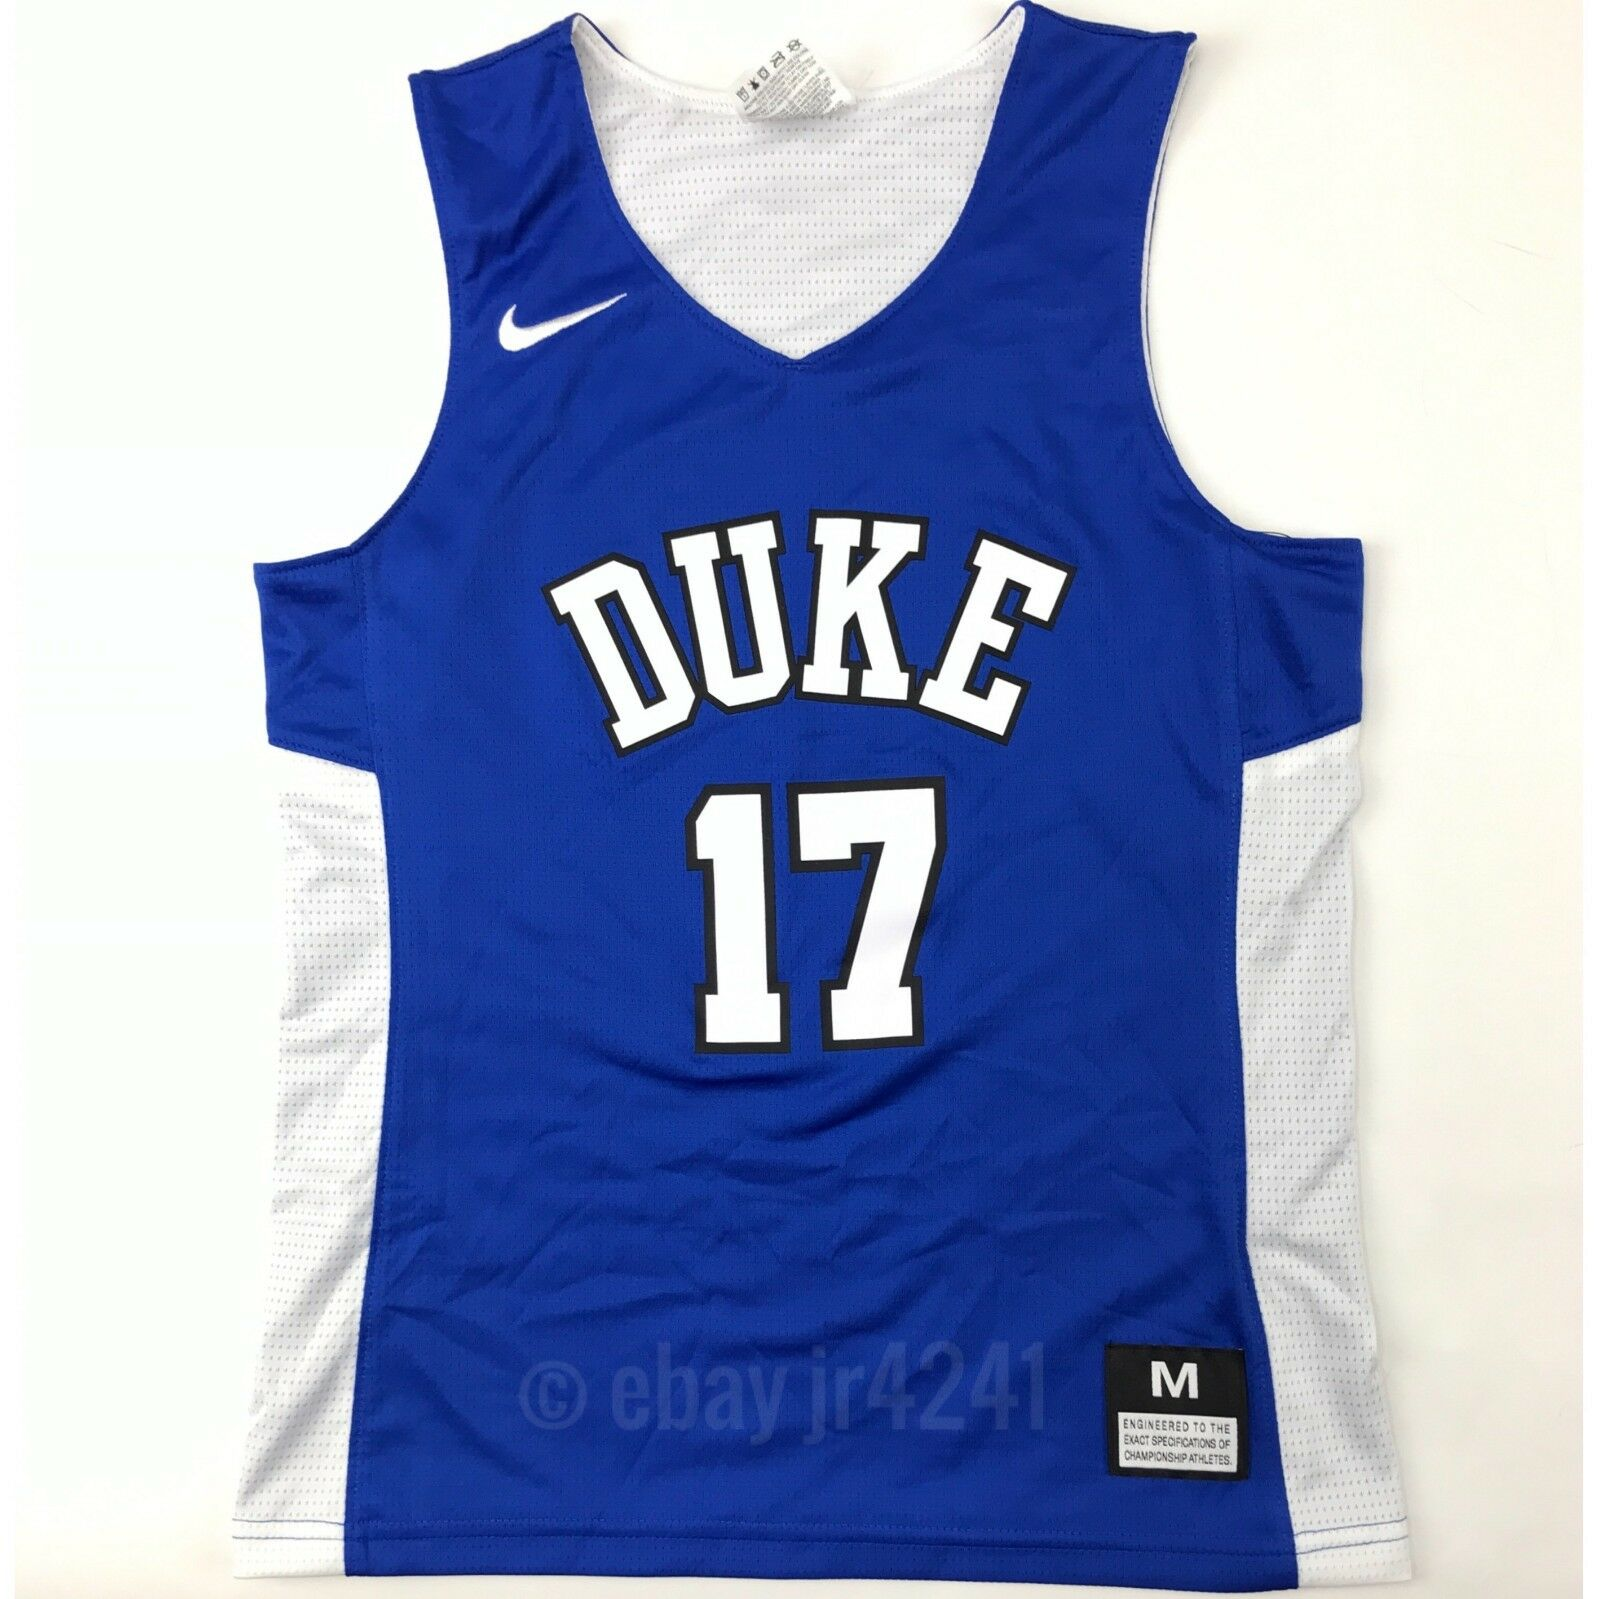 08fd51e2a New Nike Boy s M Duke Blue Devils Reversible Basketball Jersey Blue White   17